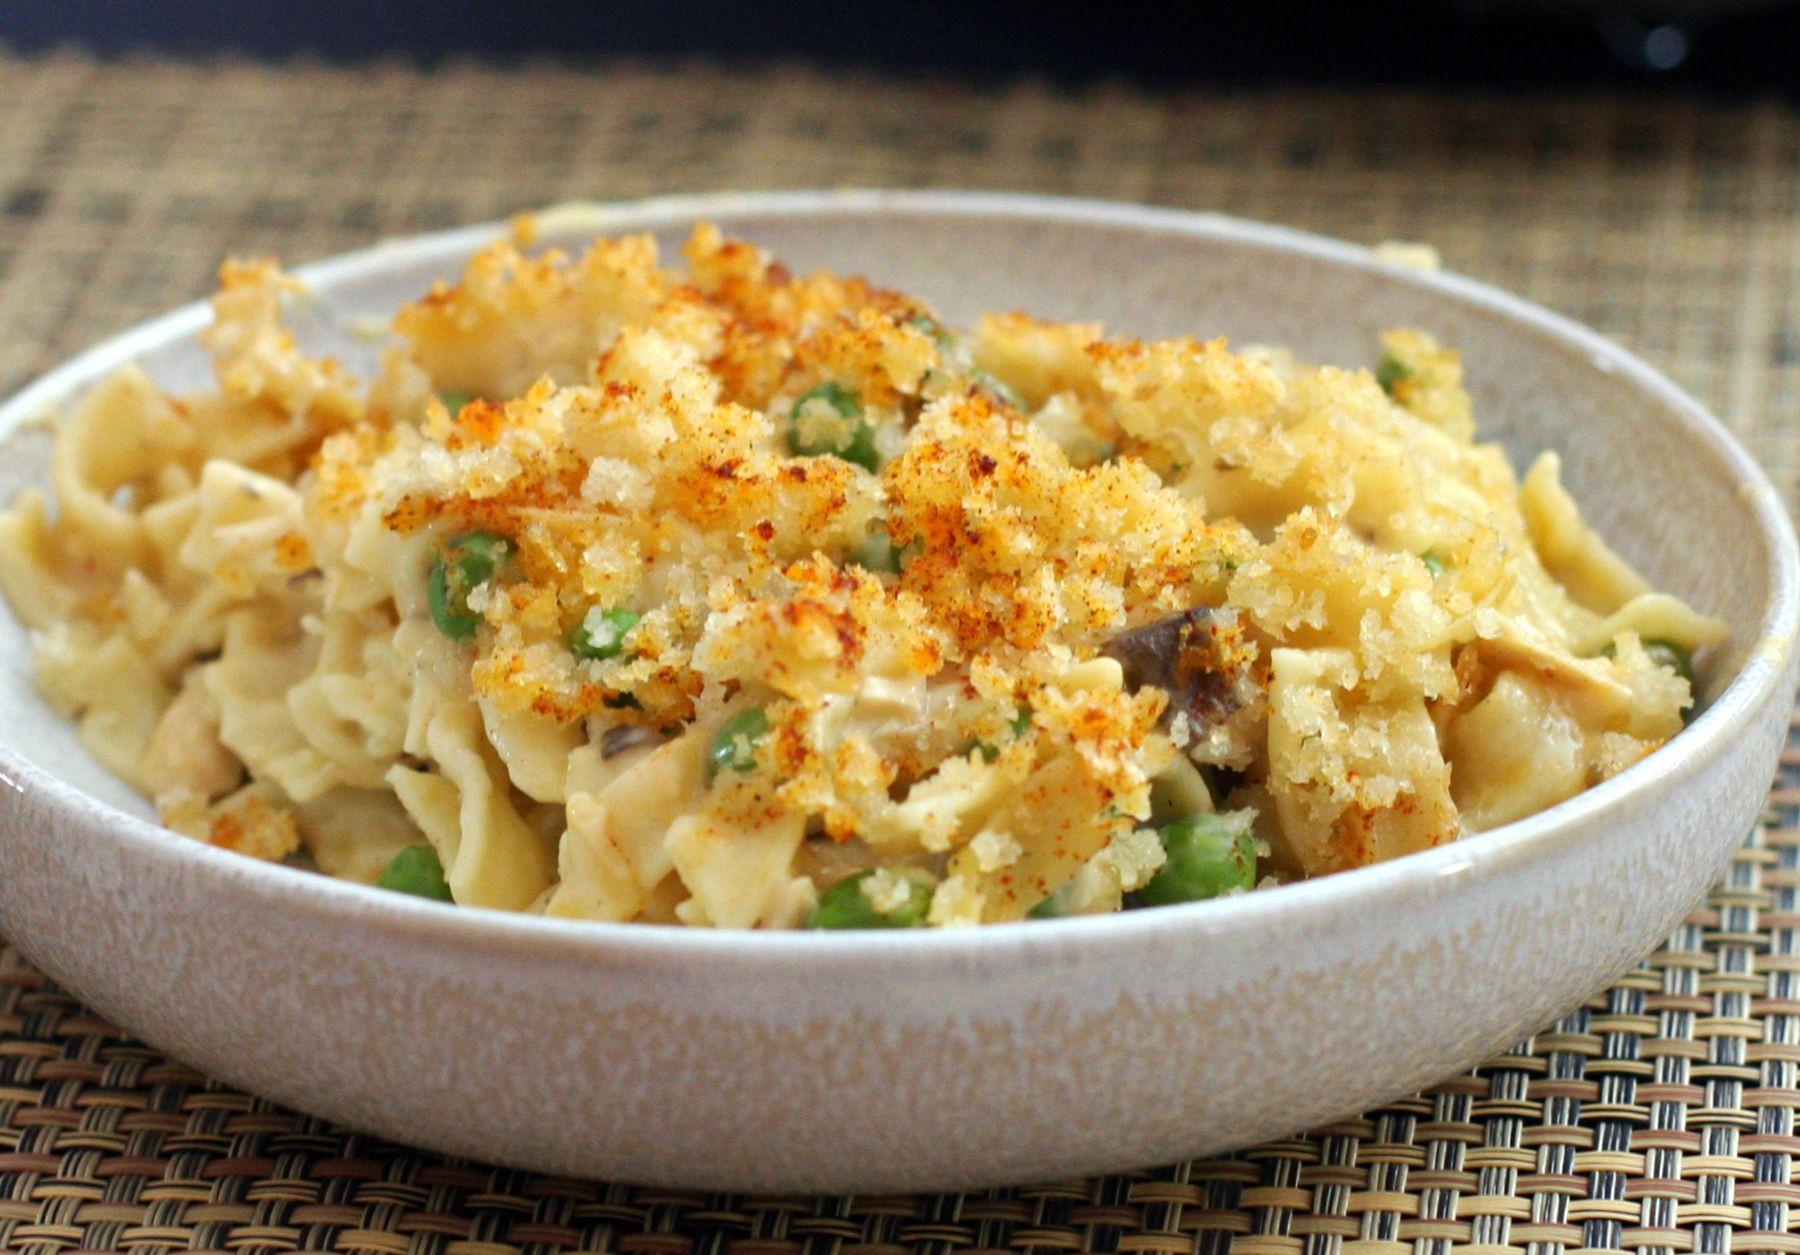 Tuna Noodle Casserole Recipes  Easy Tuna Noodle Casserole Recipe With Cheddar Cheese